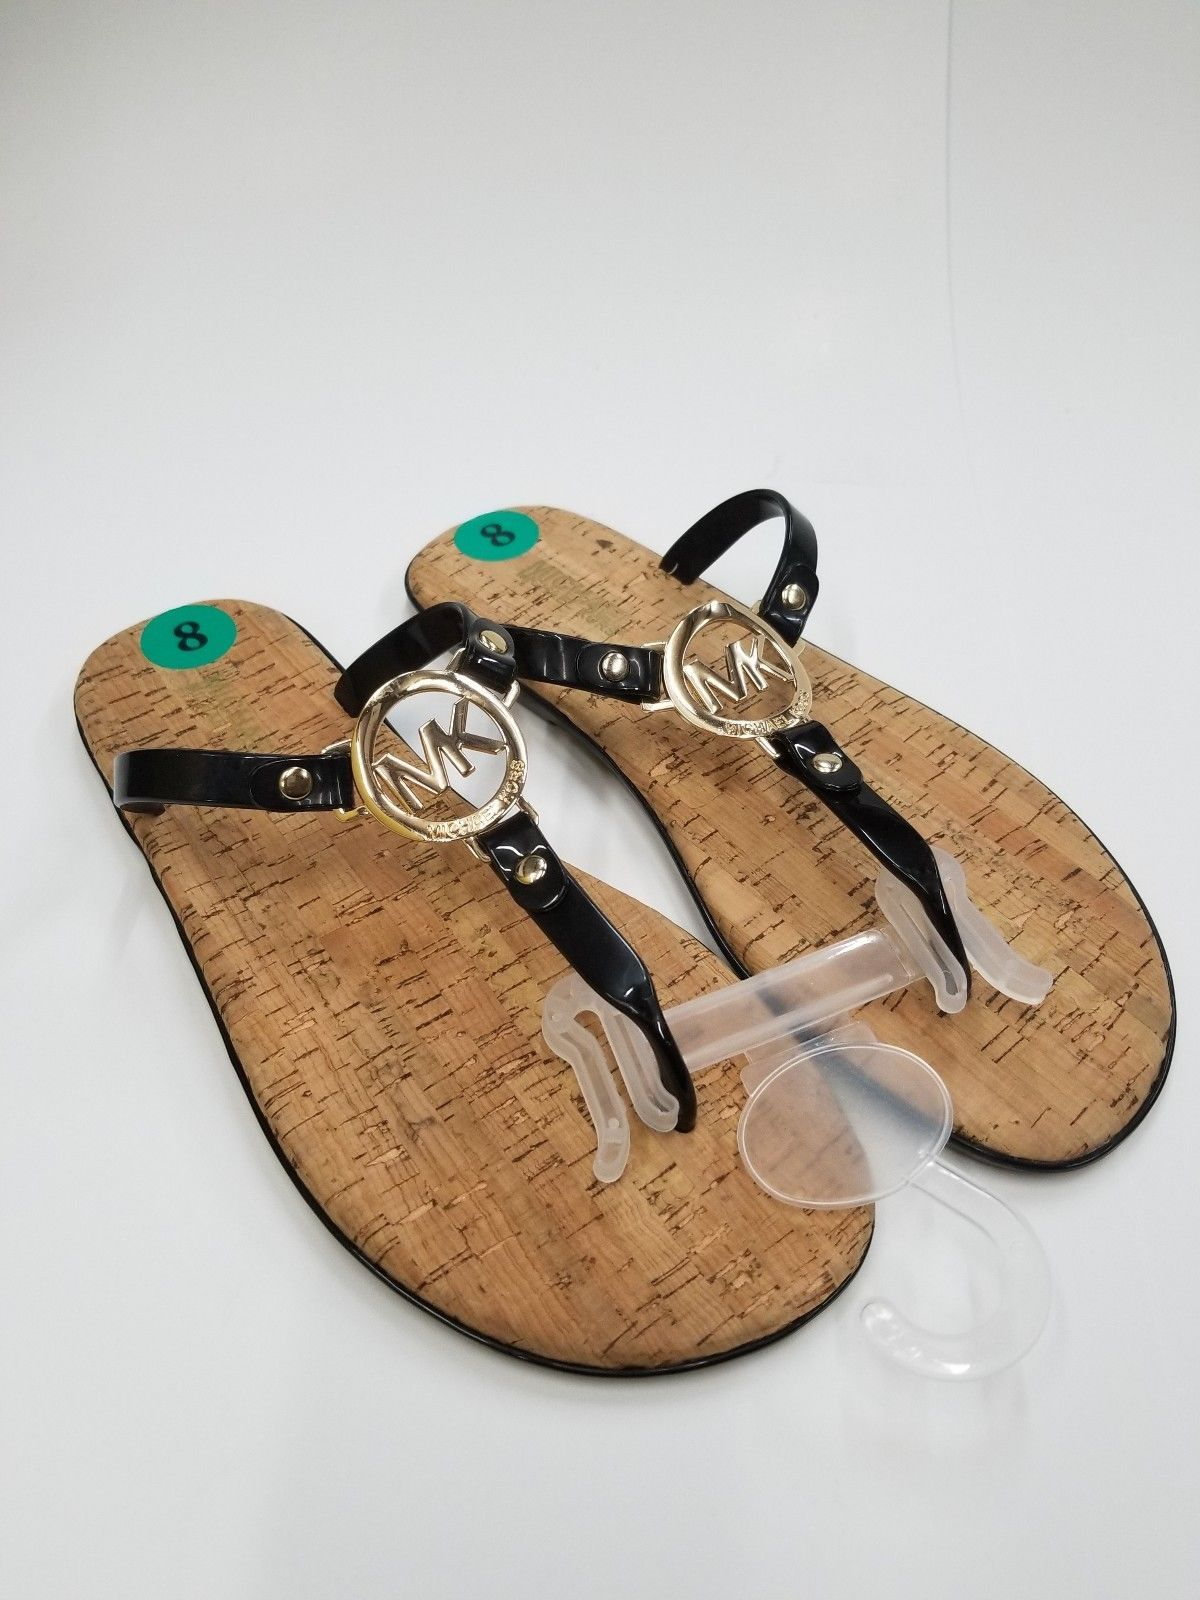 3f908e005 Michael Kors Ladies Sandals Size 8 Black NEW and 50 similar items. S l1600